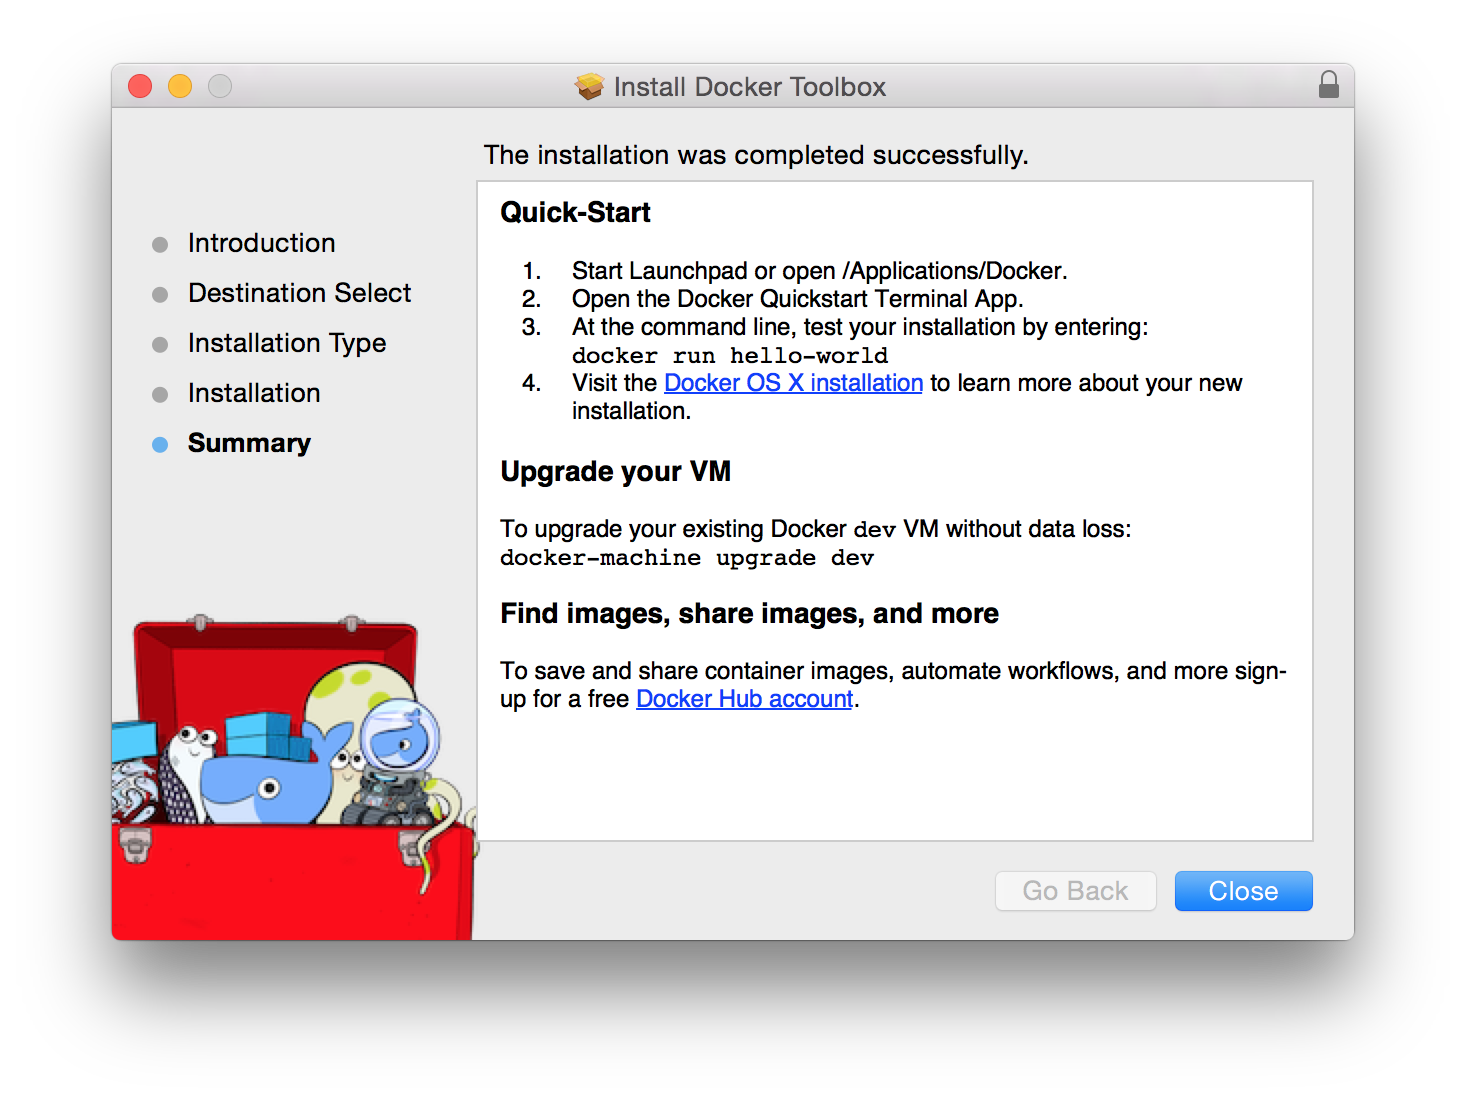 docker-toolkit-installation-summary